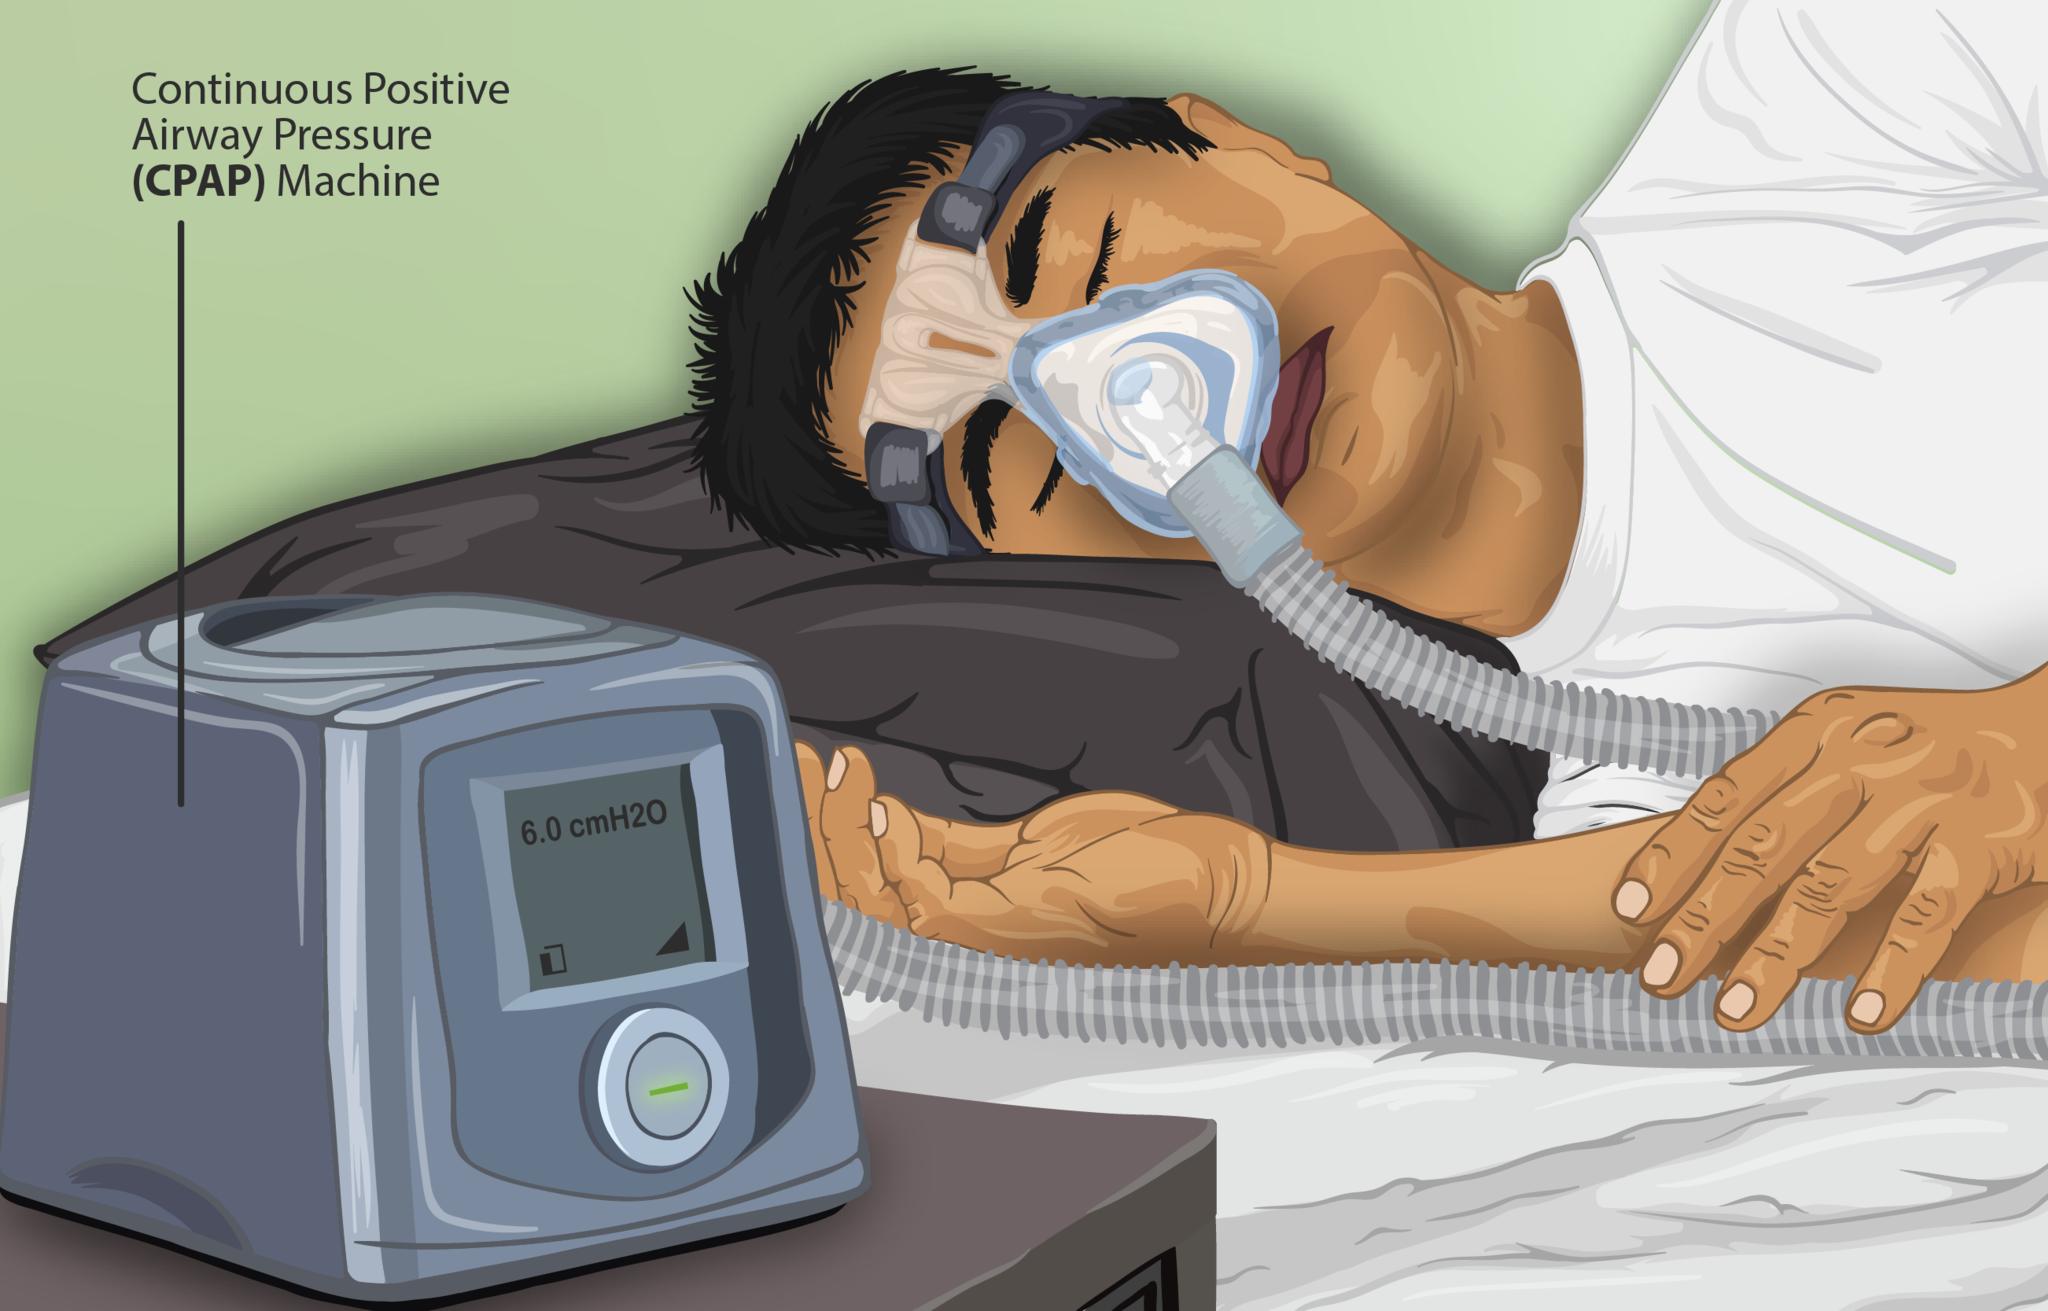 15.5.7 CPAP to Treat Sleep Apnea